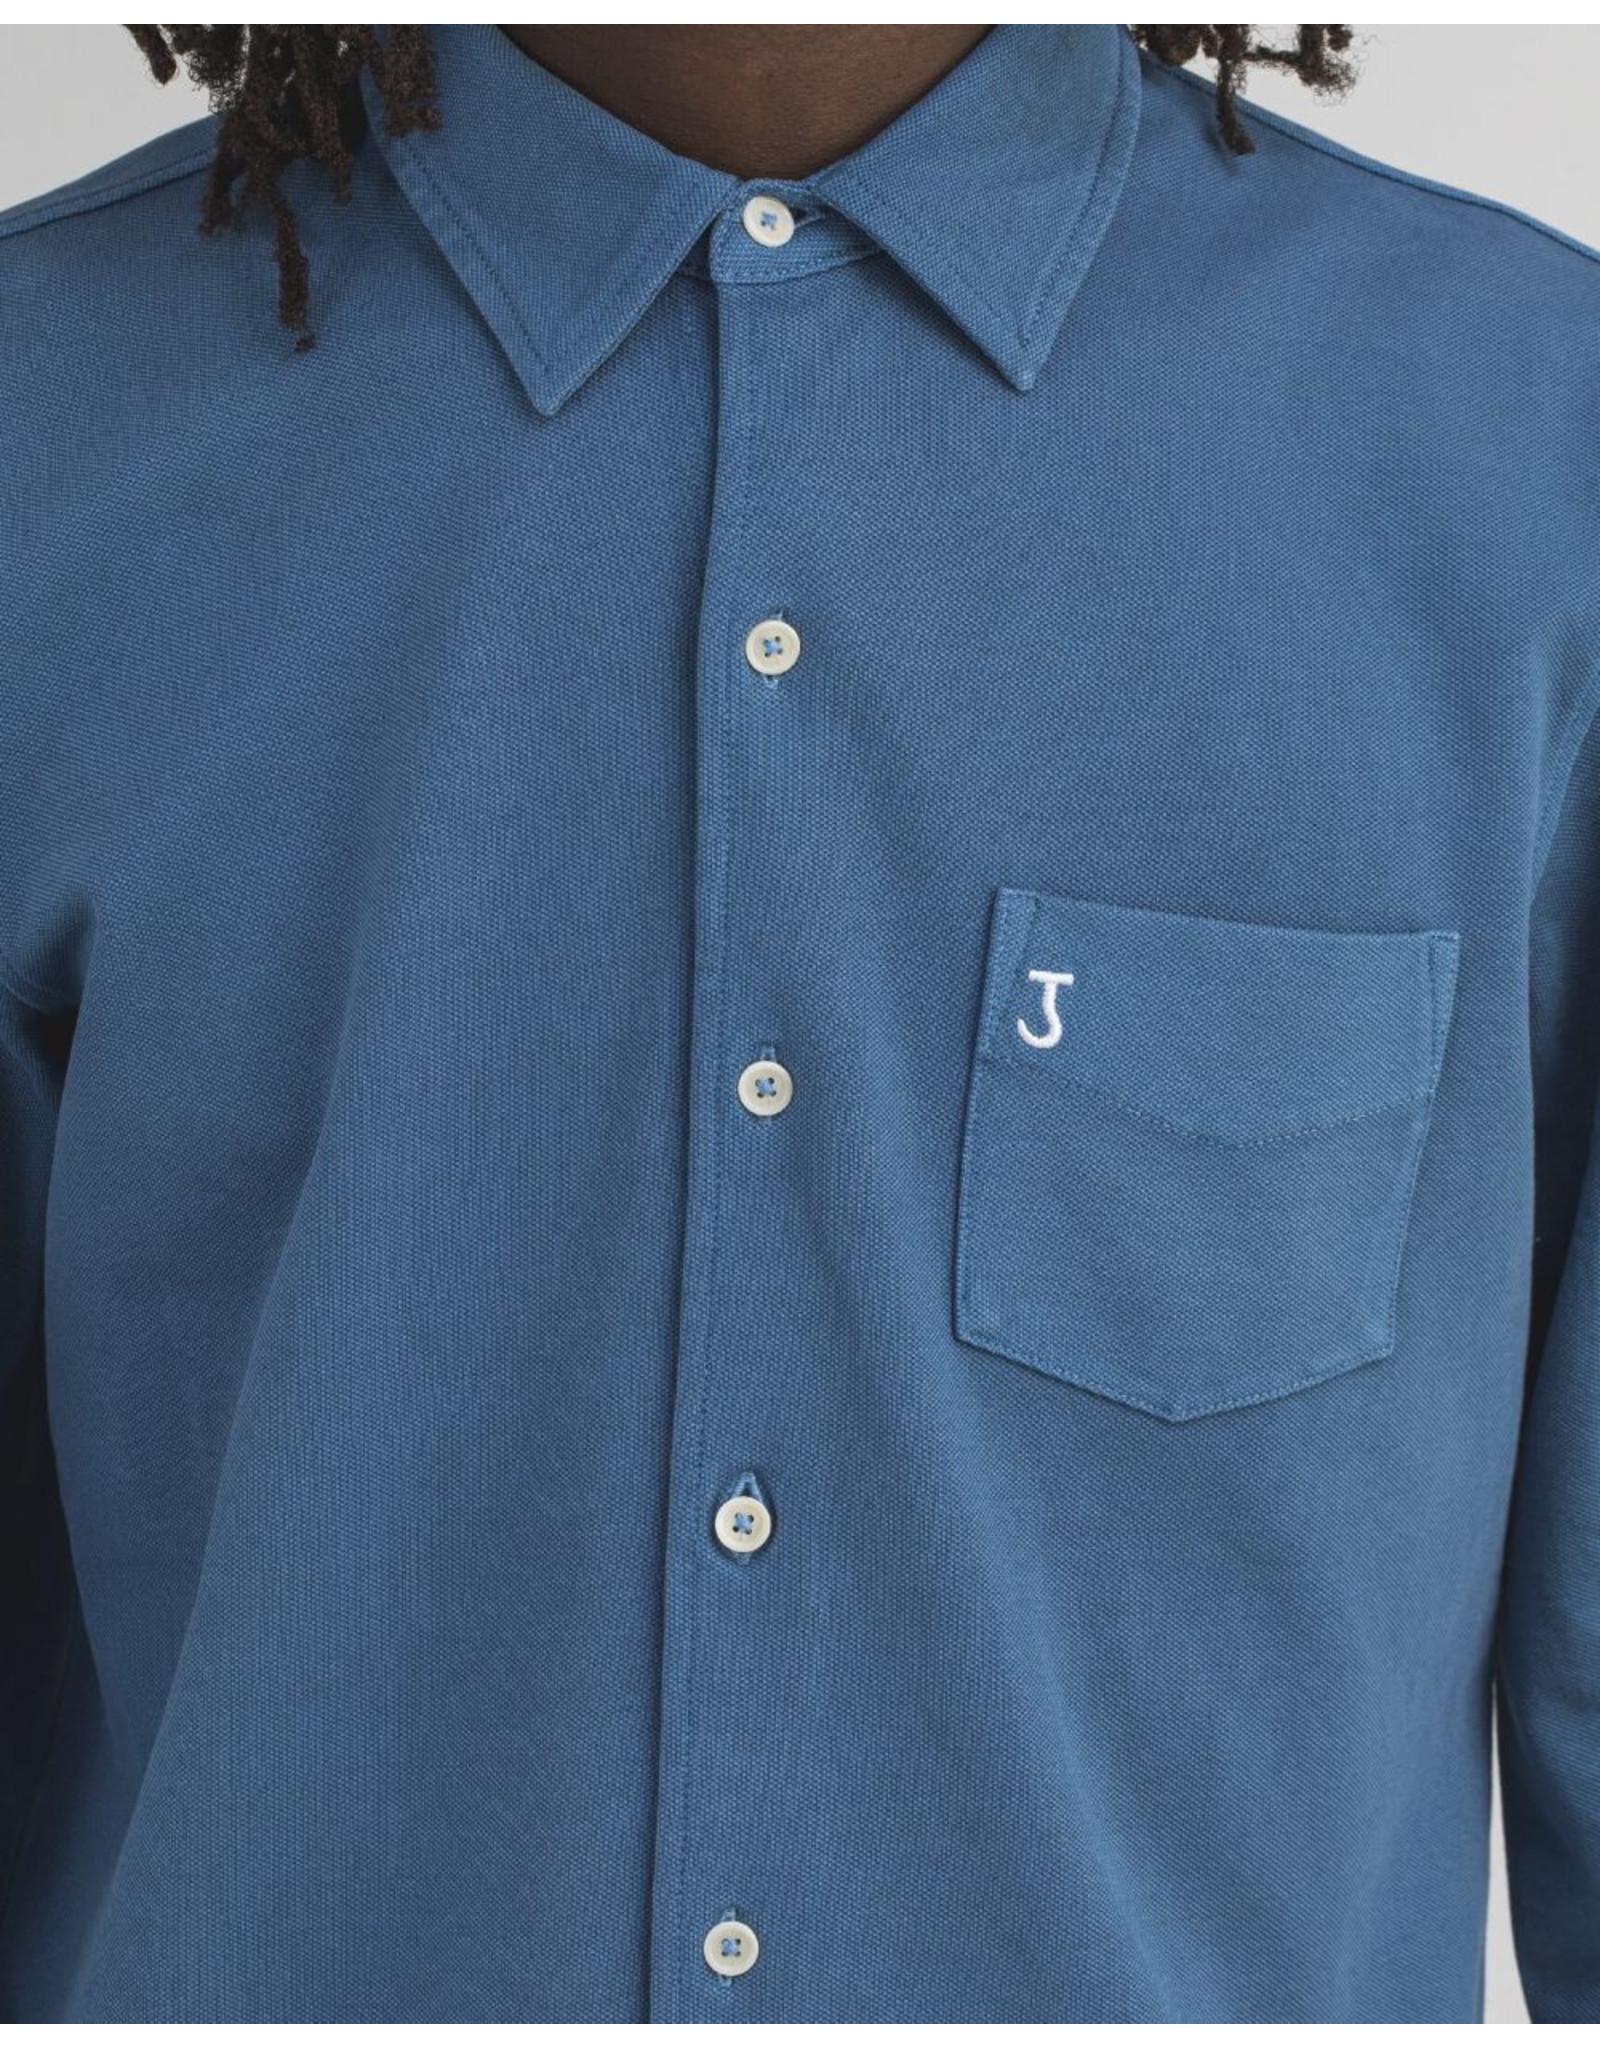 Butcher of Blue Merced pique shirt l/s